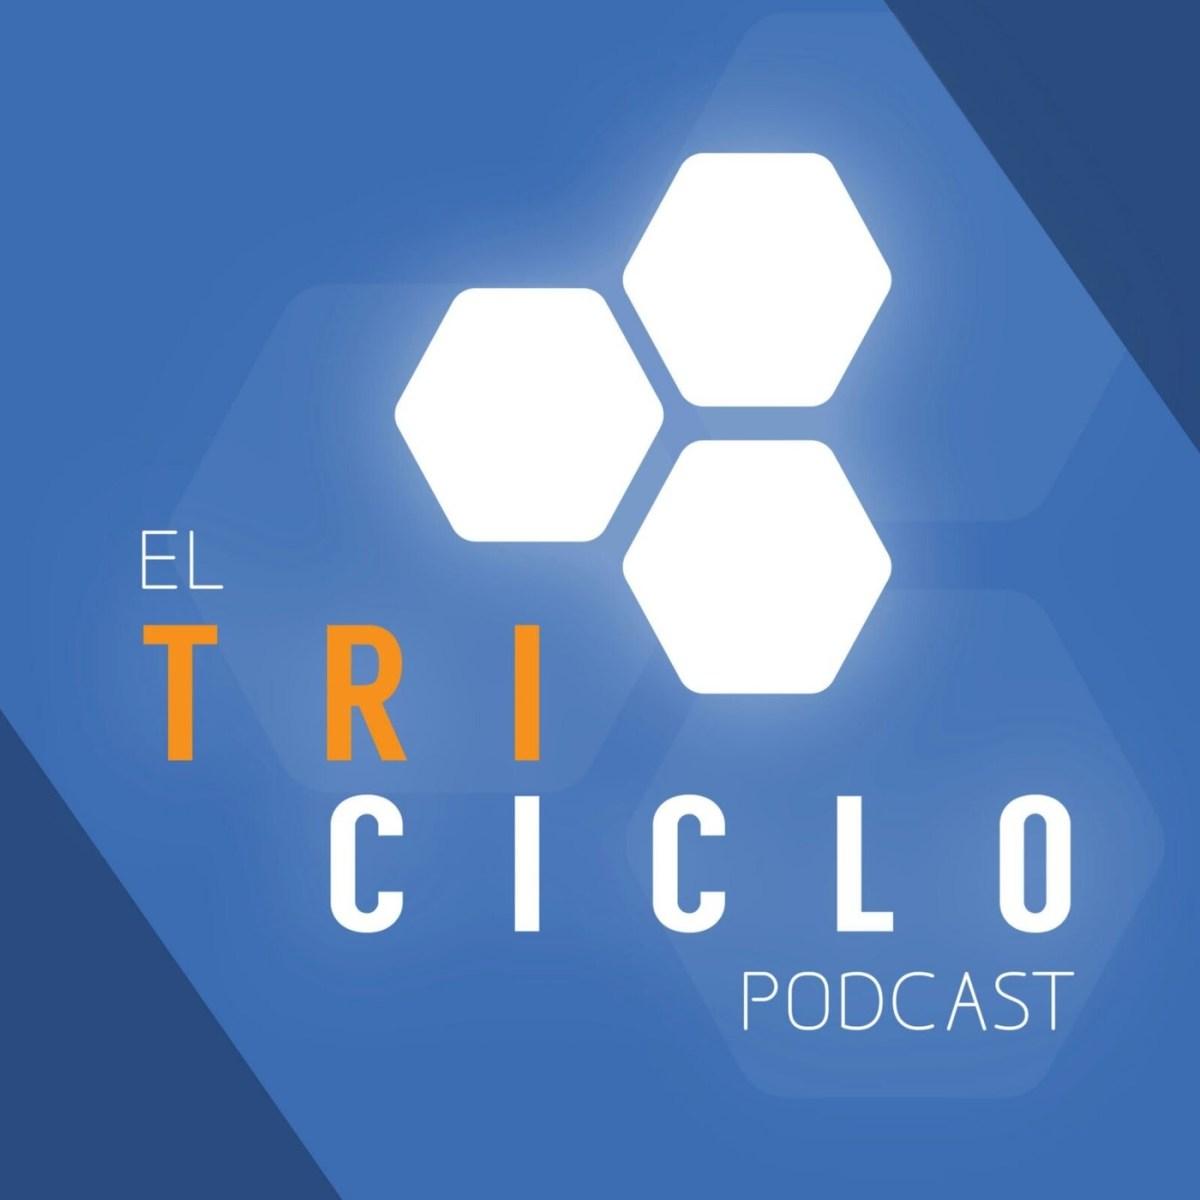 El triciclo Podcast